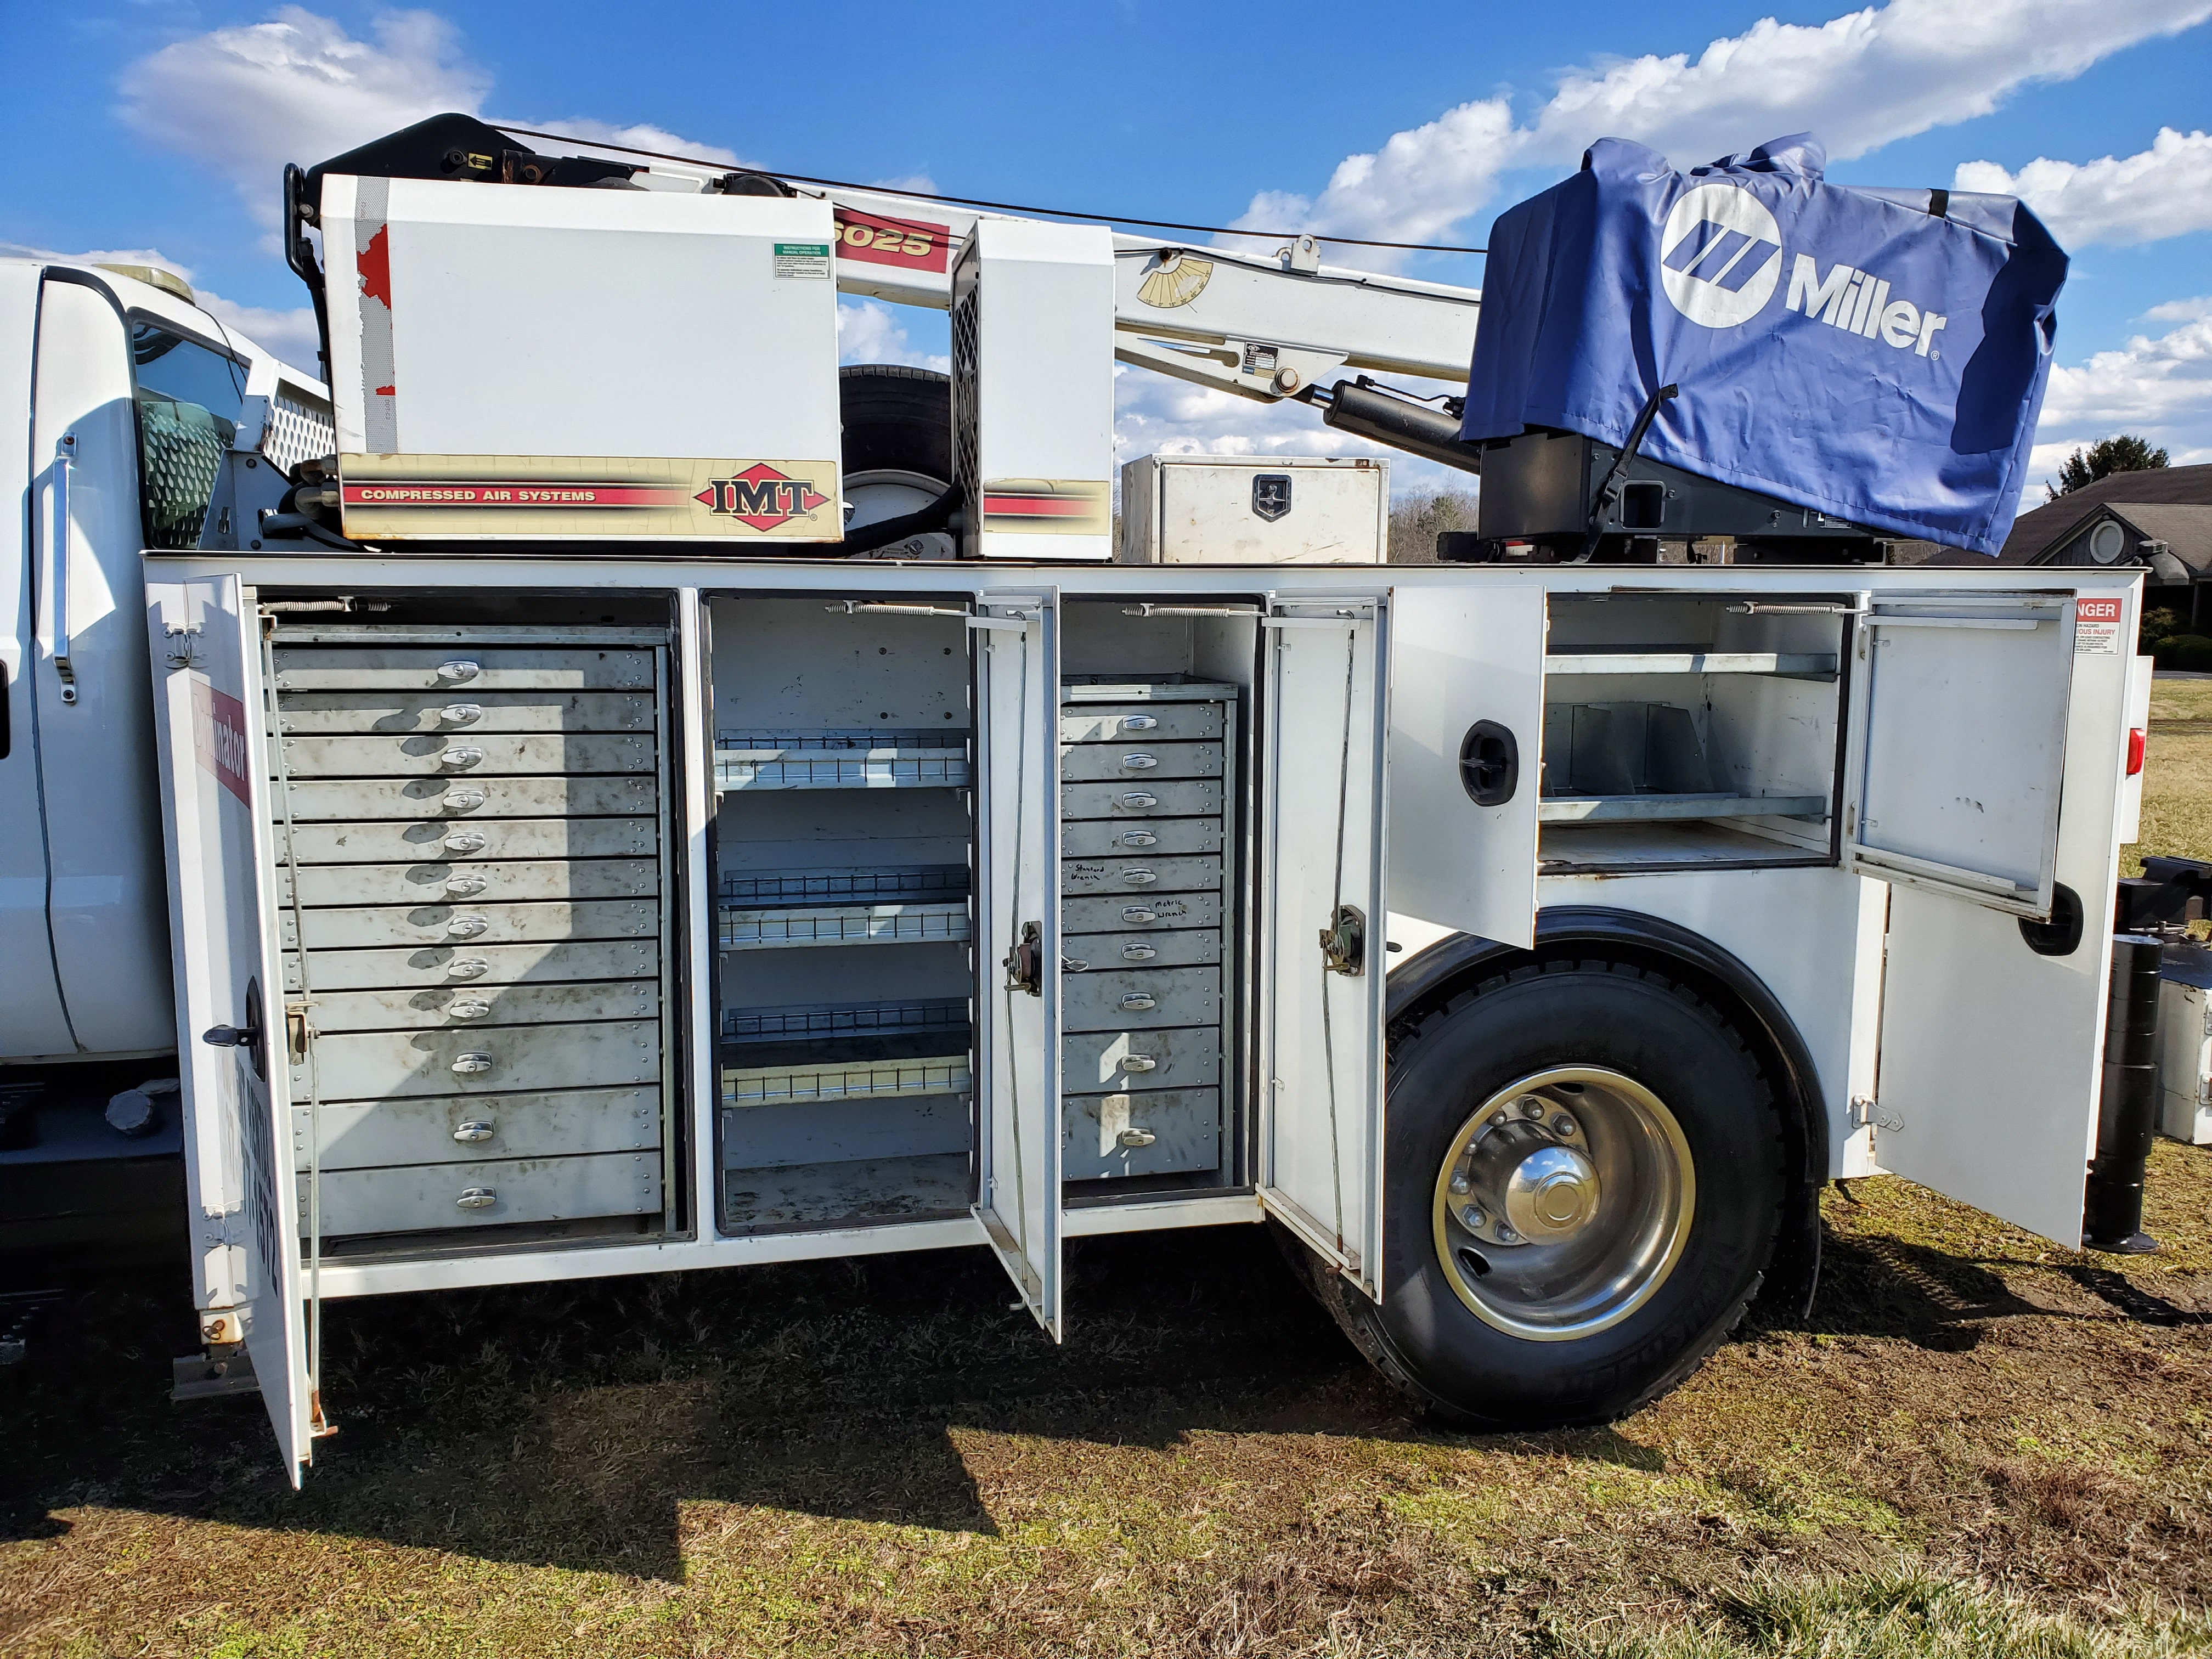 2007 Ford F750 Mechanic's Crane Truck, Cat C7 ACERT Diesel, Auto, 13 ft. IMF Dominator Body - Image 14 of 33